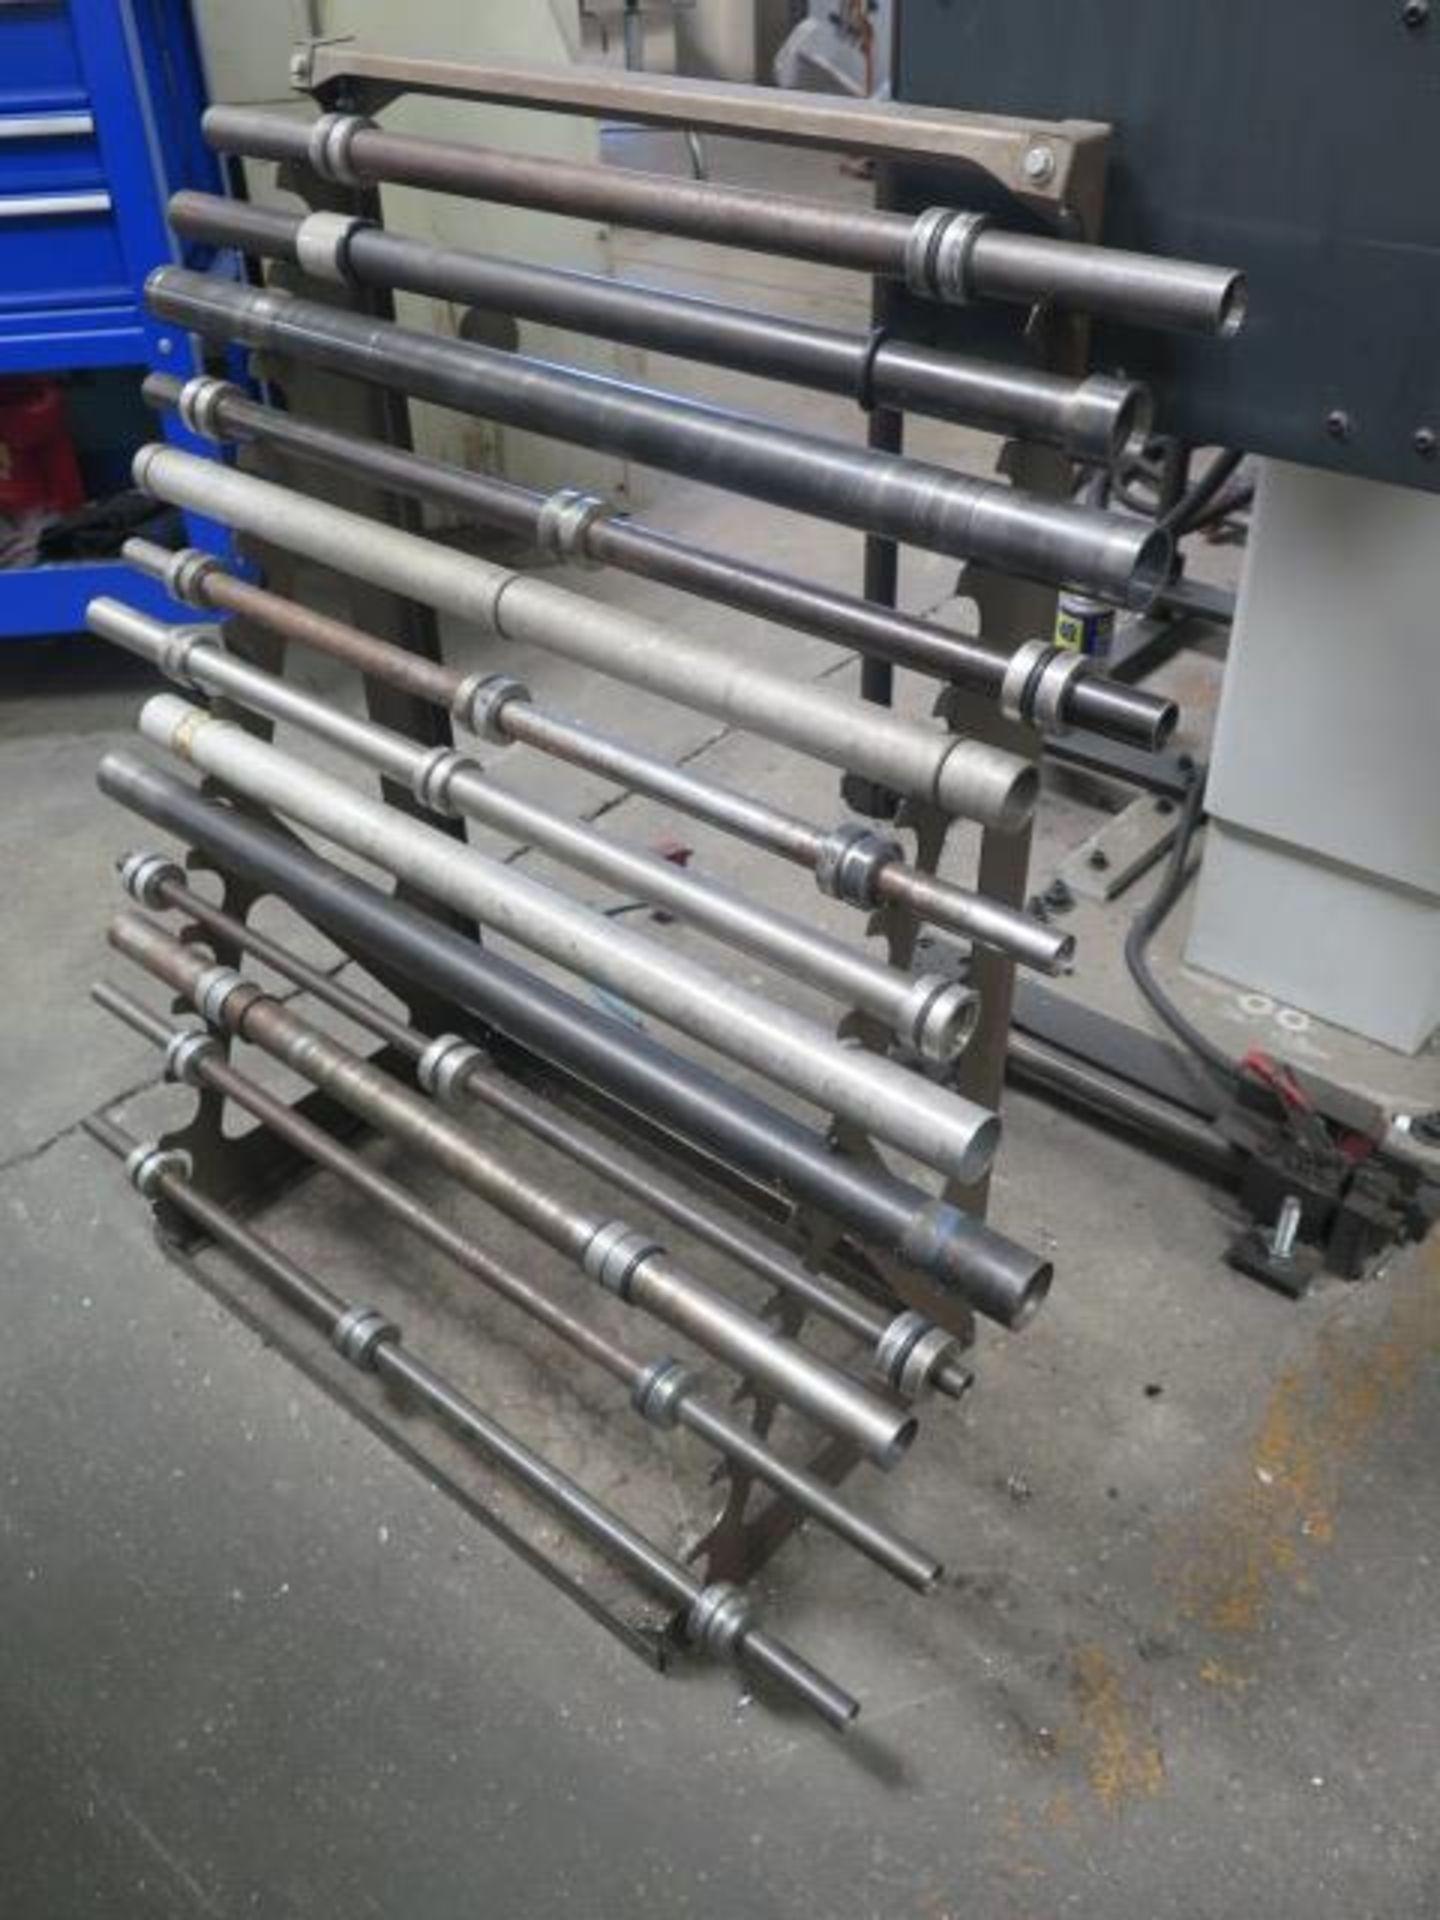 2004 Kia Super KIA Turn 15 CNC Turning Center s/n SKT150905 w/ Fanuc Series 0i-TB Contrs, SOLD AS IS - Image 15 of 16